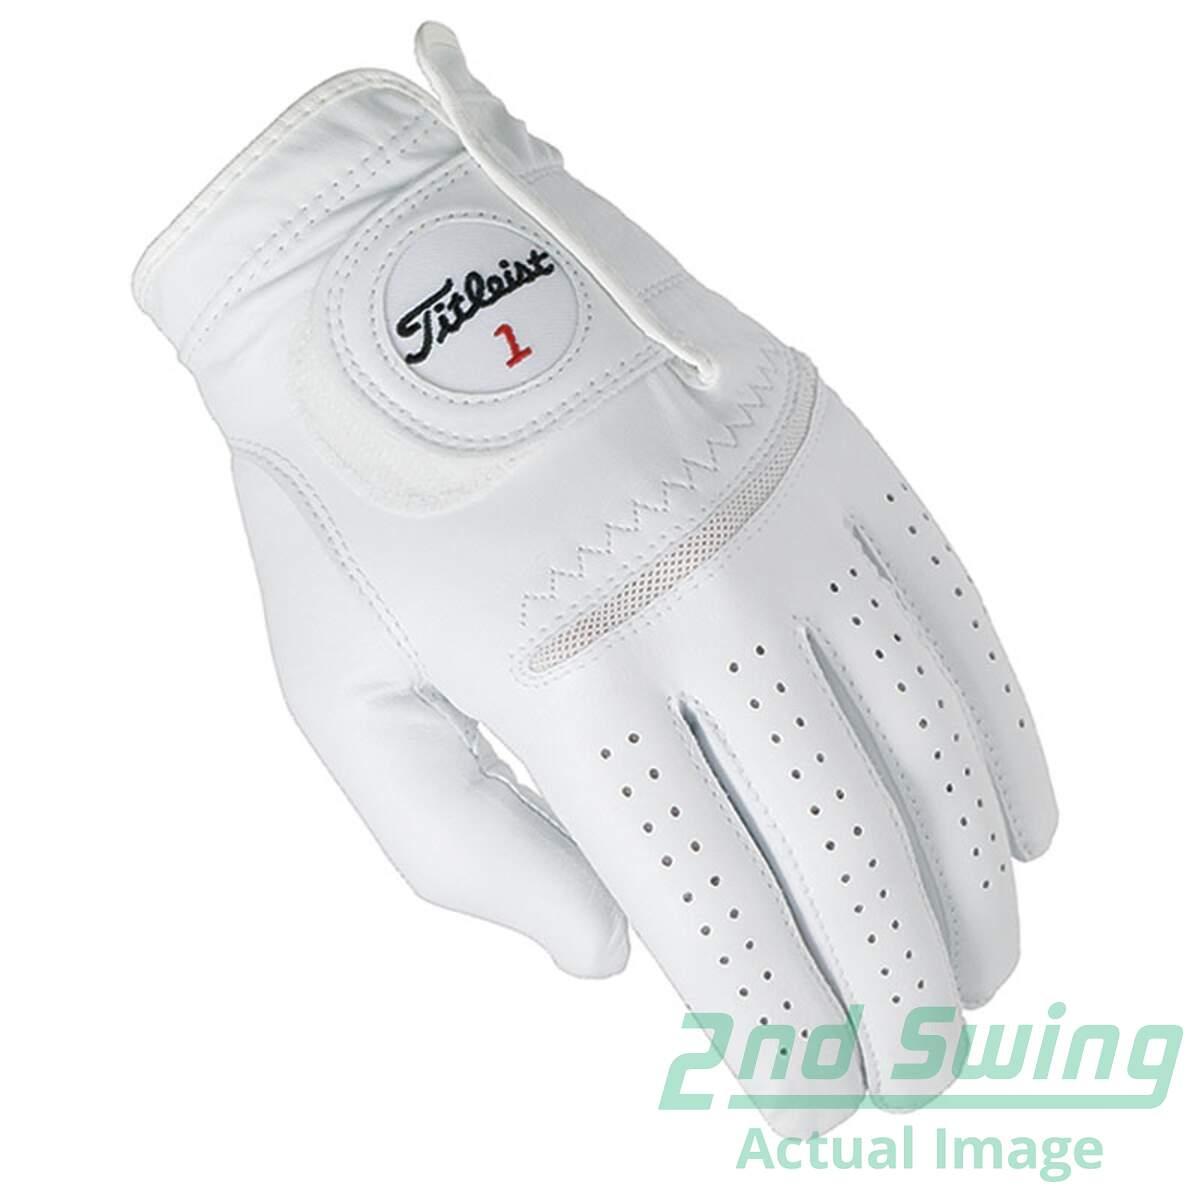 Mens golf gloves xxl - New Mens Titleist Permasoft Mens Golf Glove Xx Large Xxl Pearl Left Handed